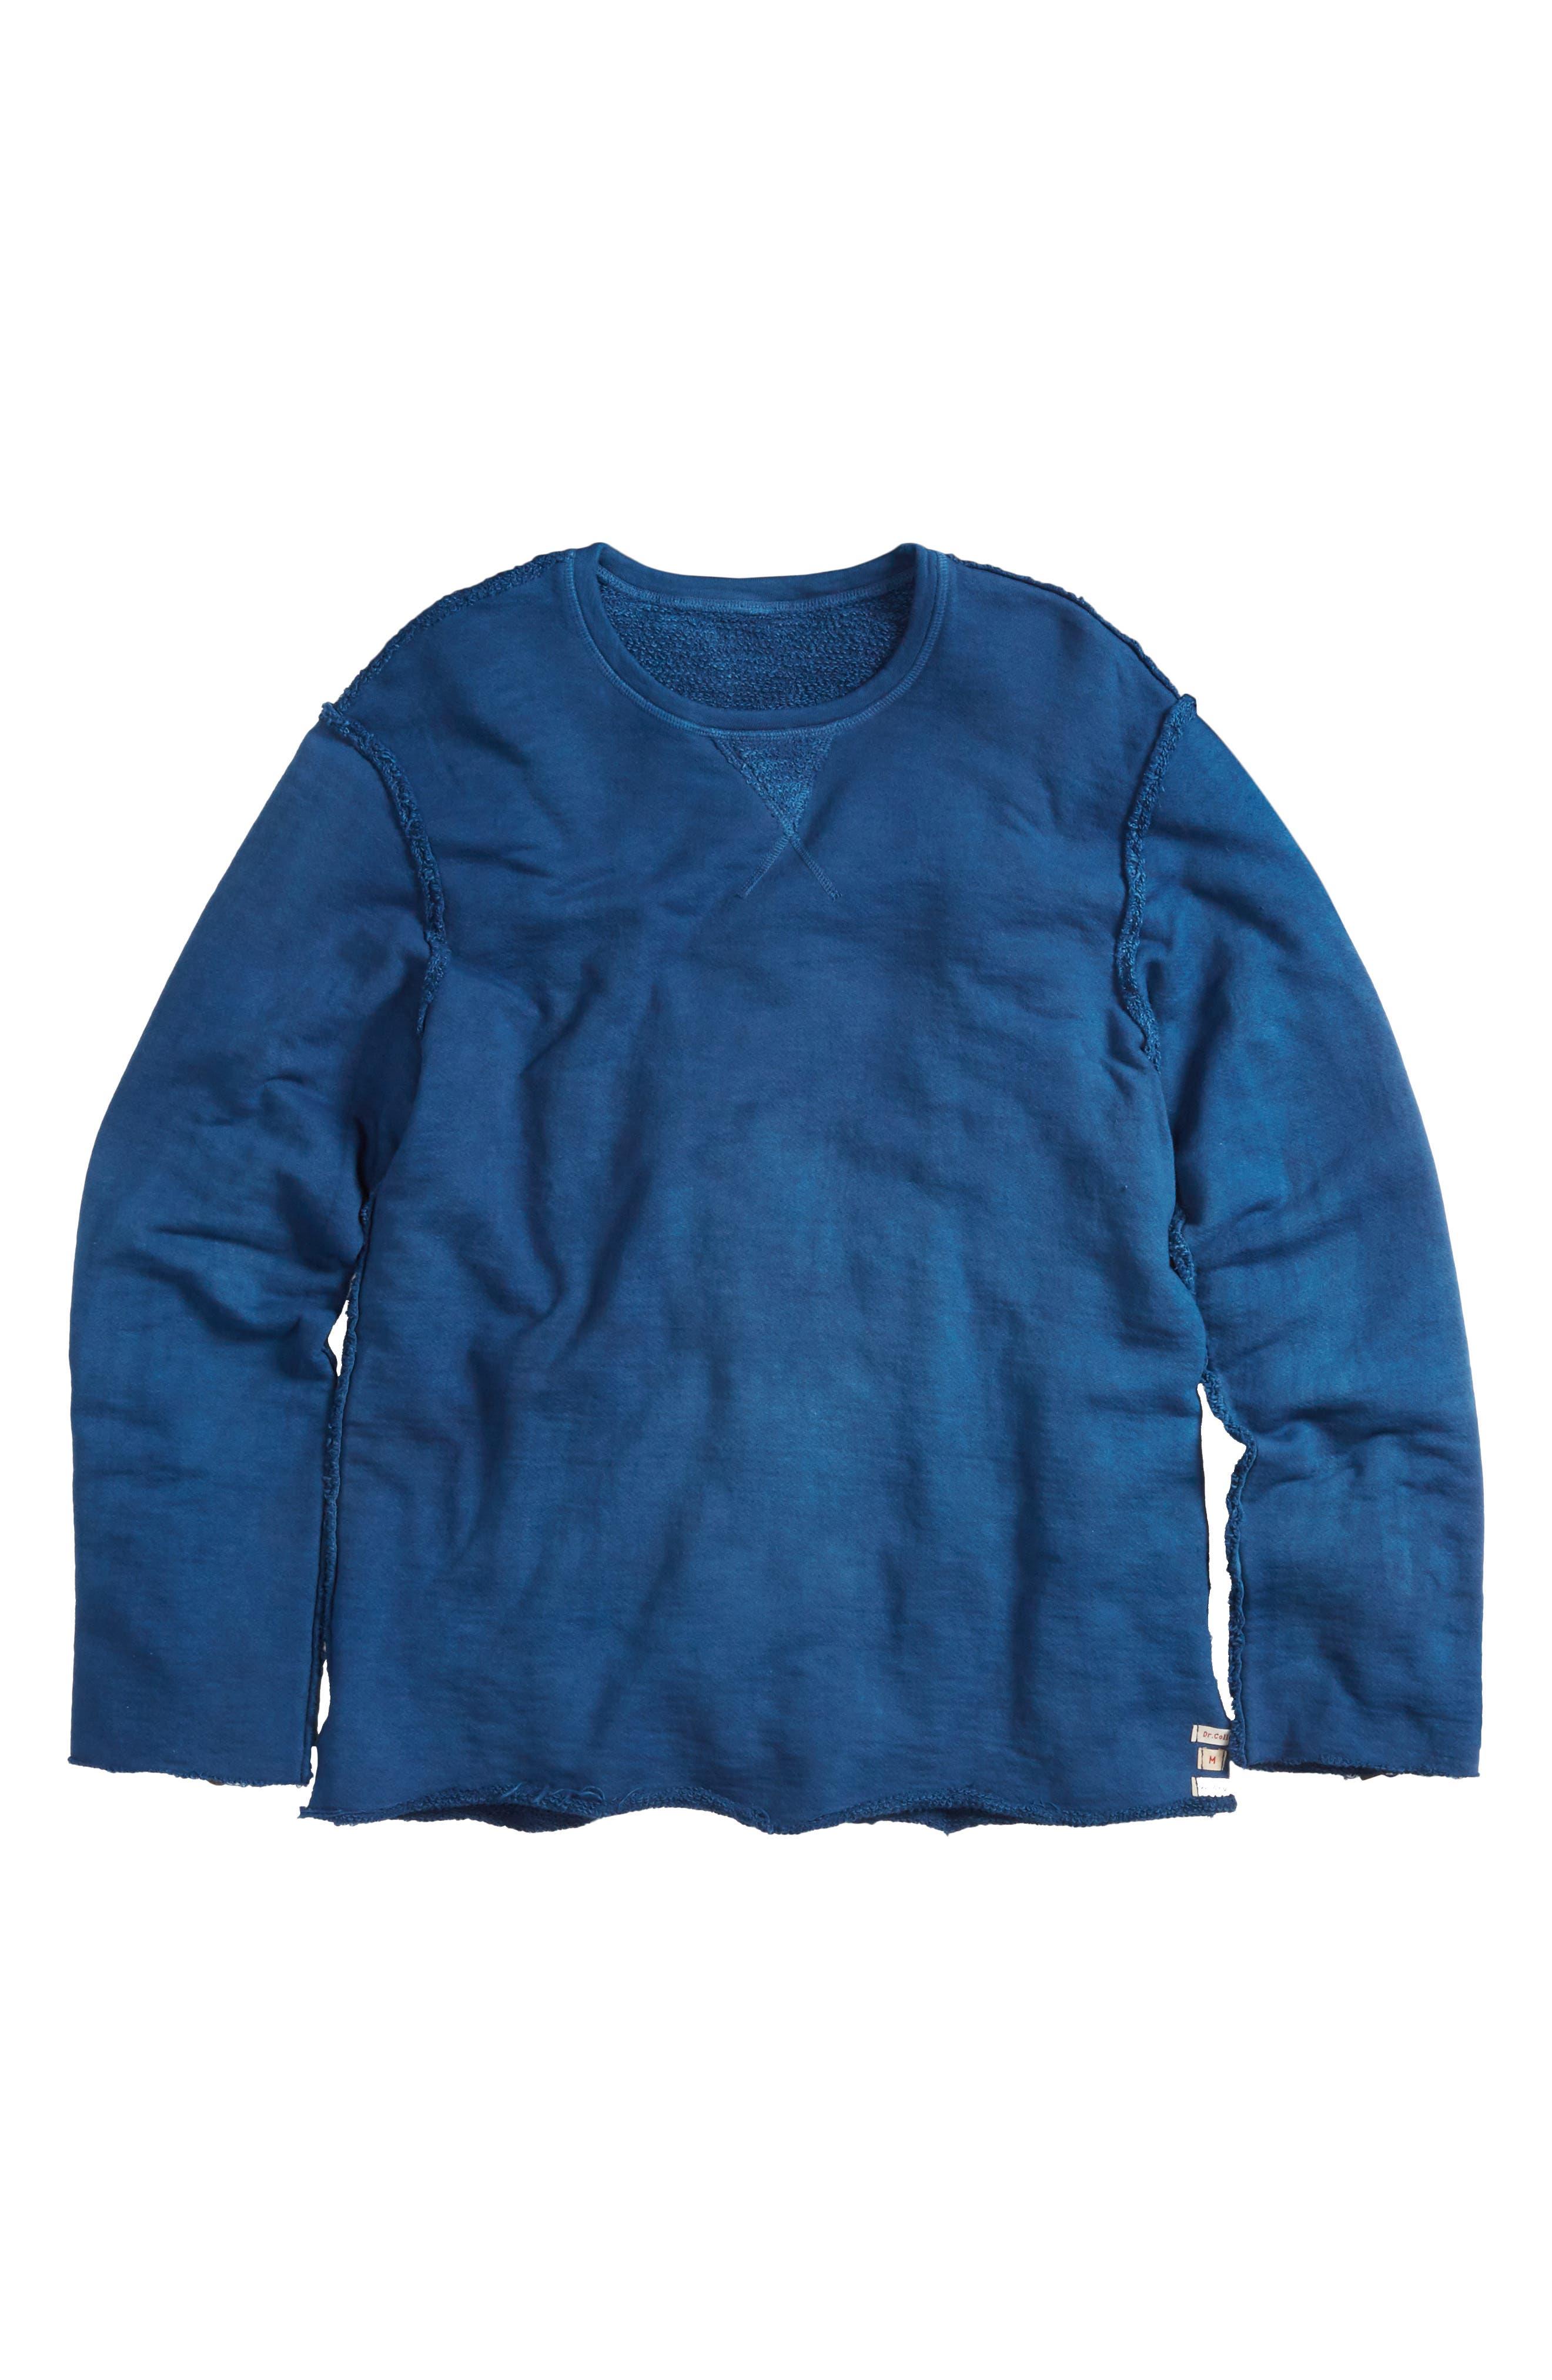 Malibu Reversible Sweatshirt,                         Main,                         color, Indigo